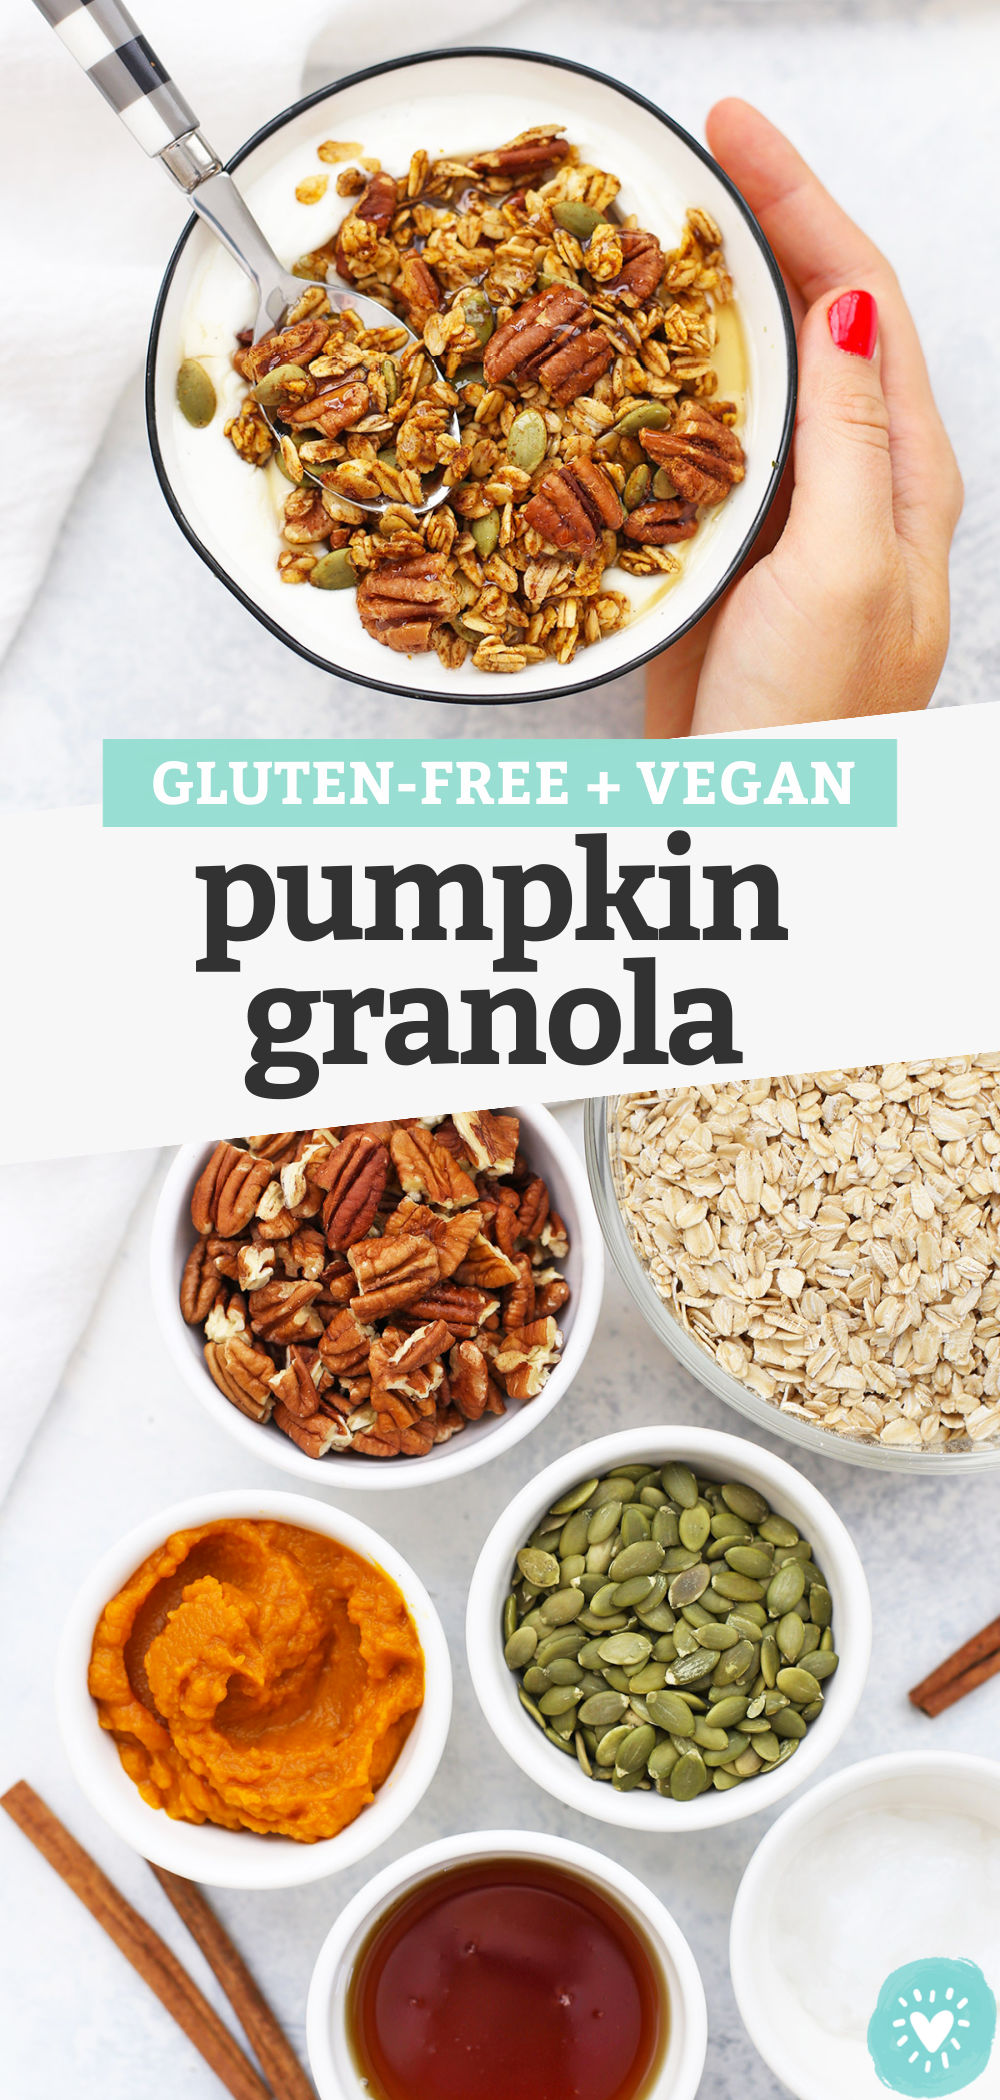 "Collage of images of gluten free pumpkin granola with text overlay that reads ""Gluten-Free + Vegan Pumpkin Granola"""